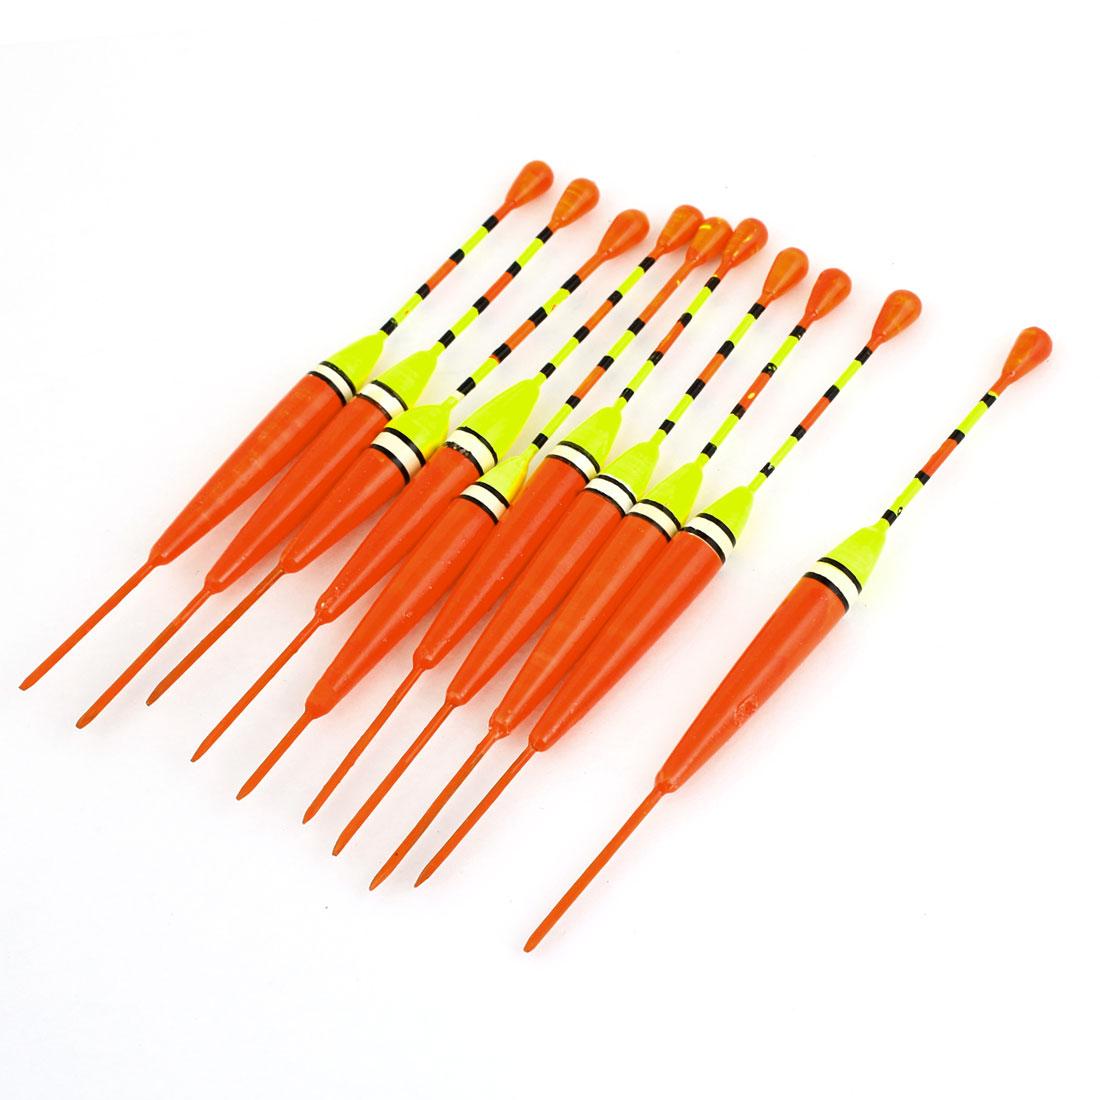 10pcs Orange Yellow Plastic Angling Fishings Float Floating Bobber 13.5cm Length